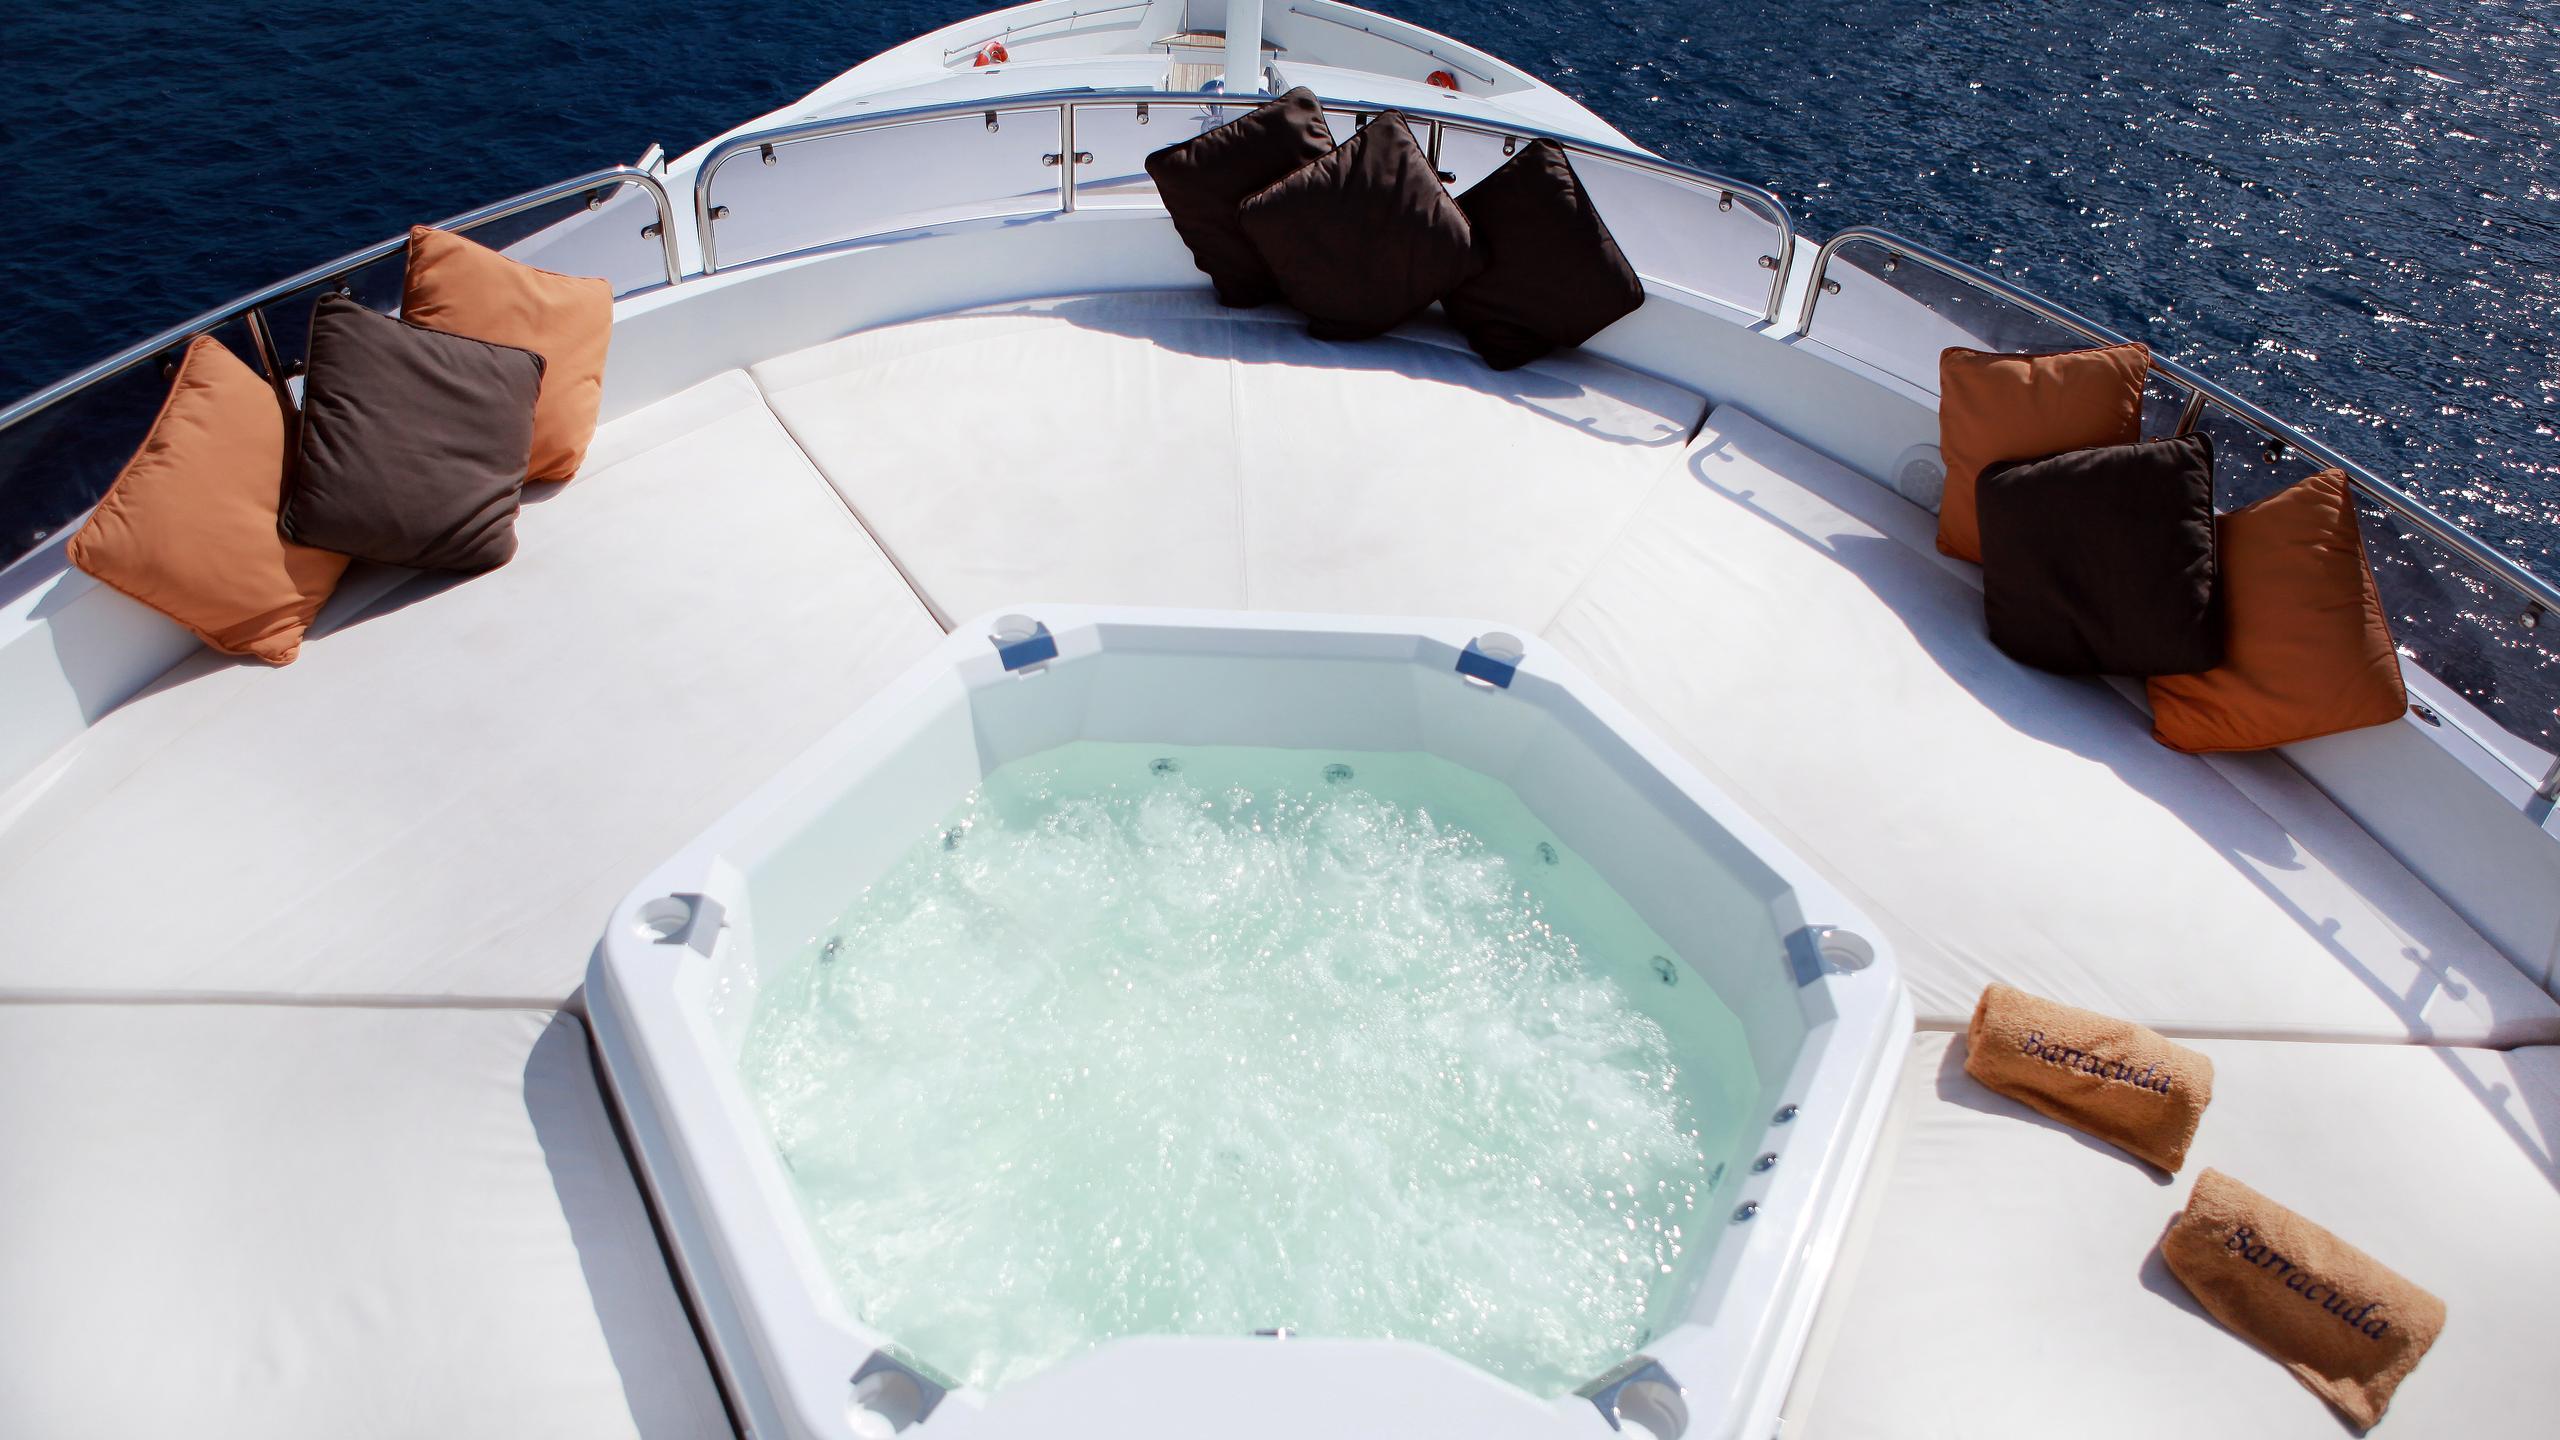 barracuda-red-sea-yacht-jacuzzi